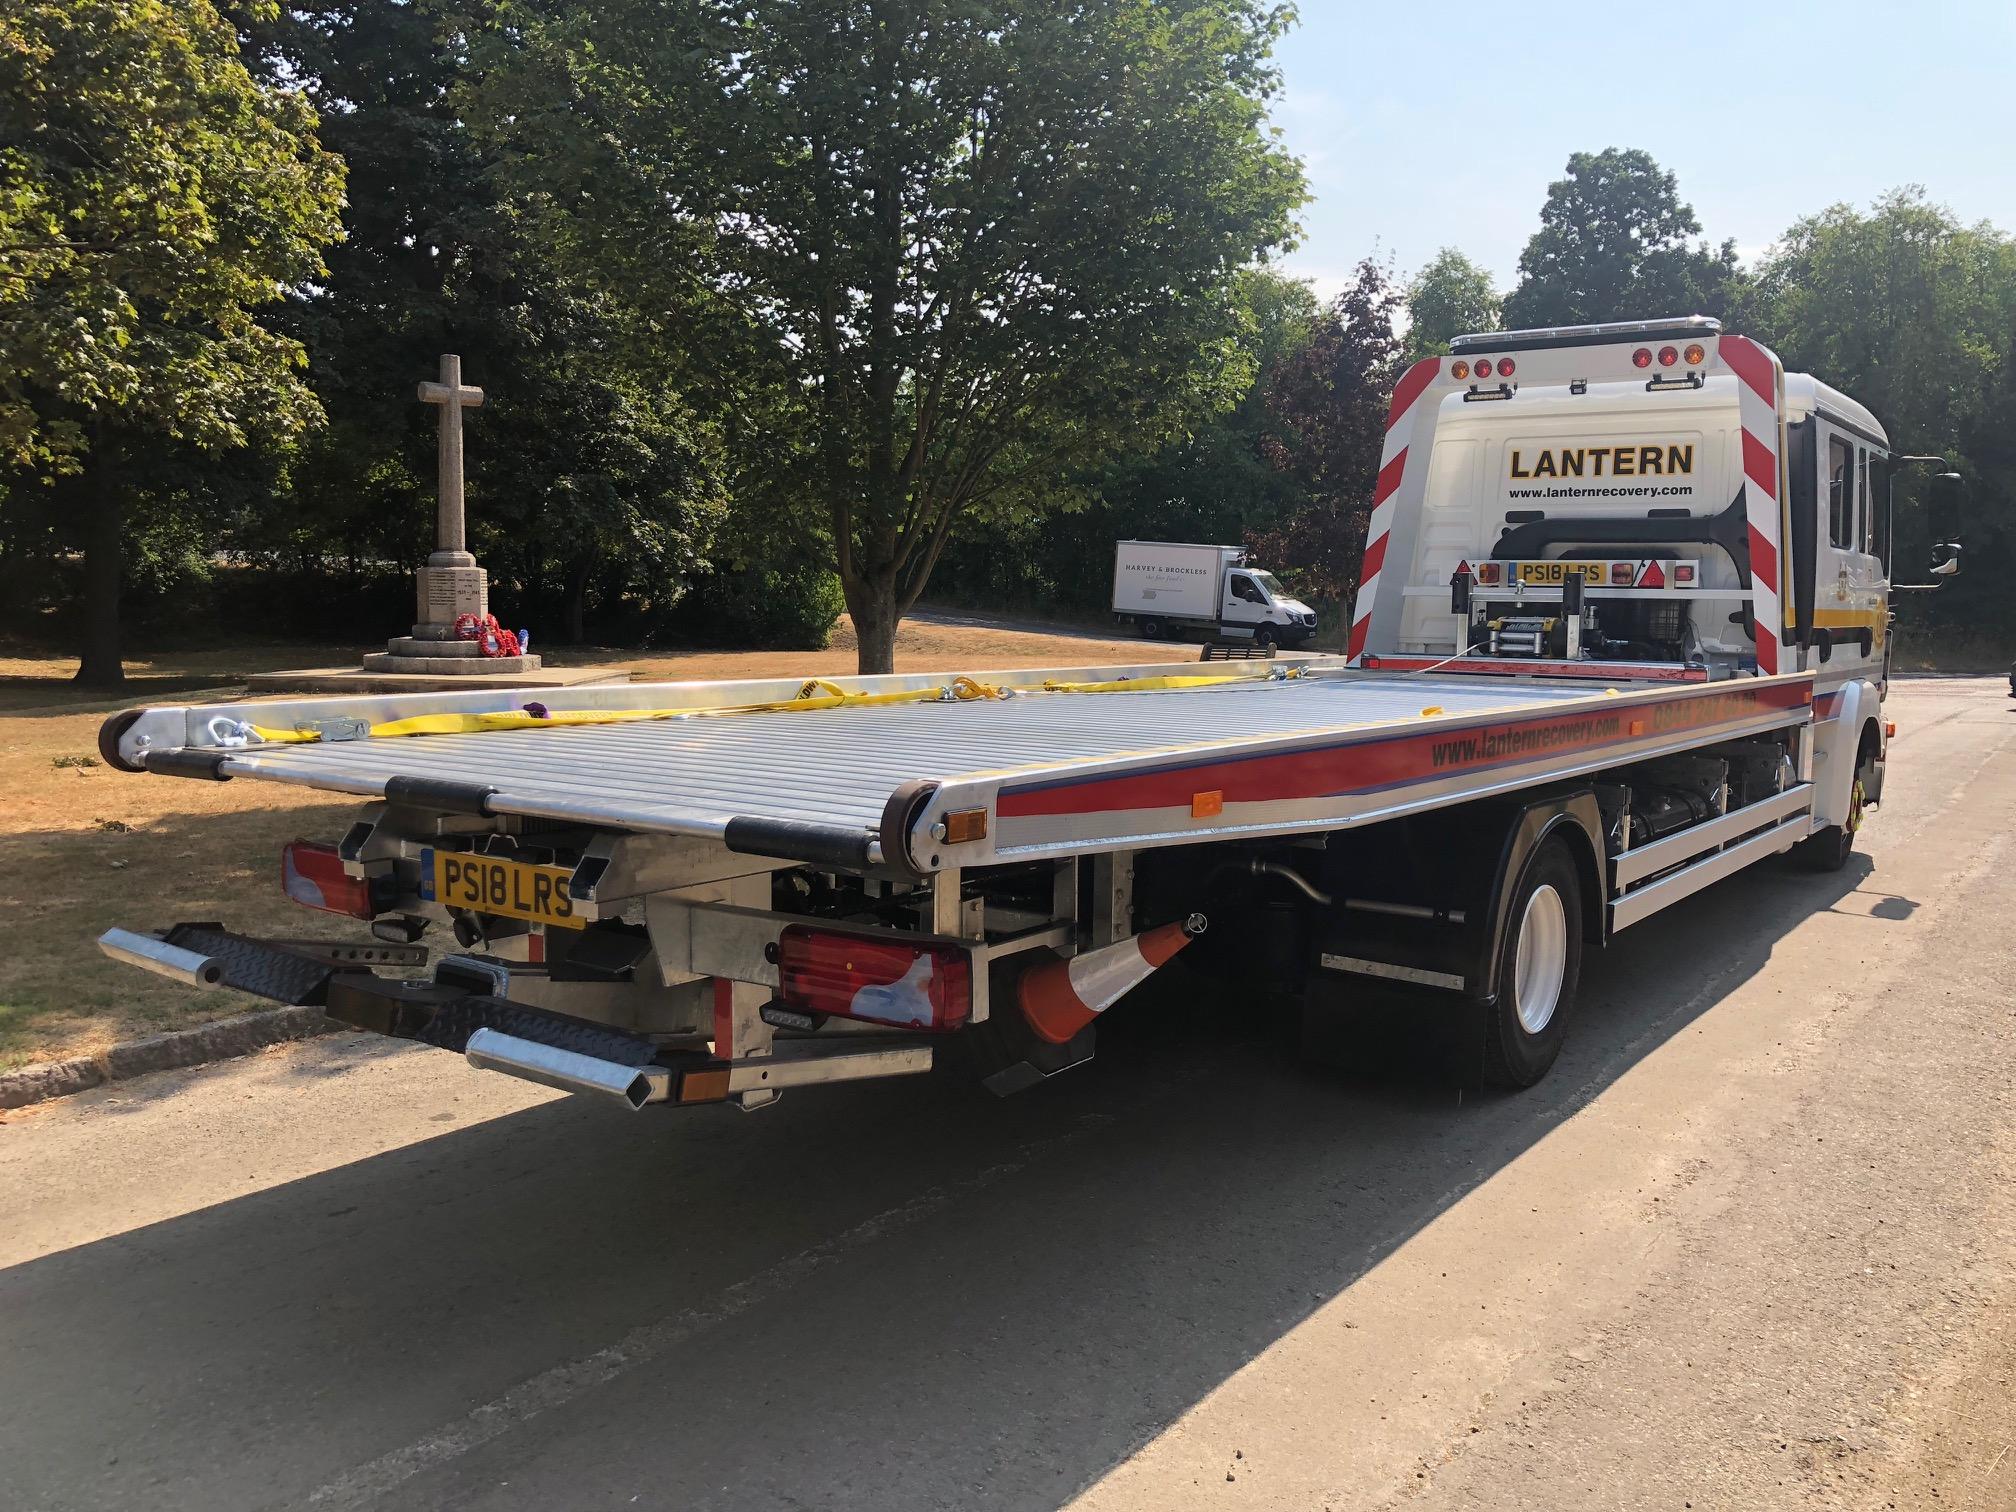 2018 '18' M.A.N TGL 12.220 Crew Cab (Euro 6) AUTO